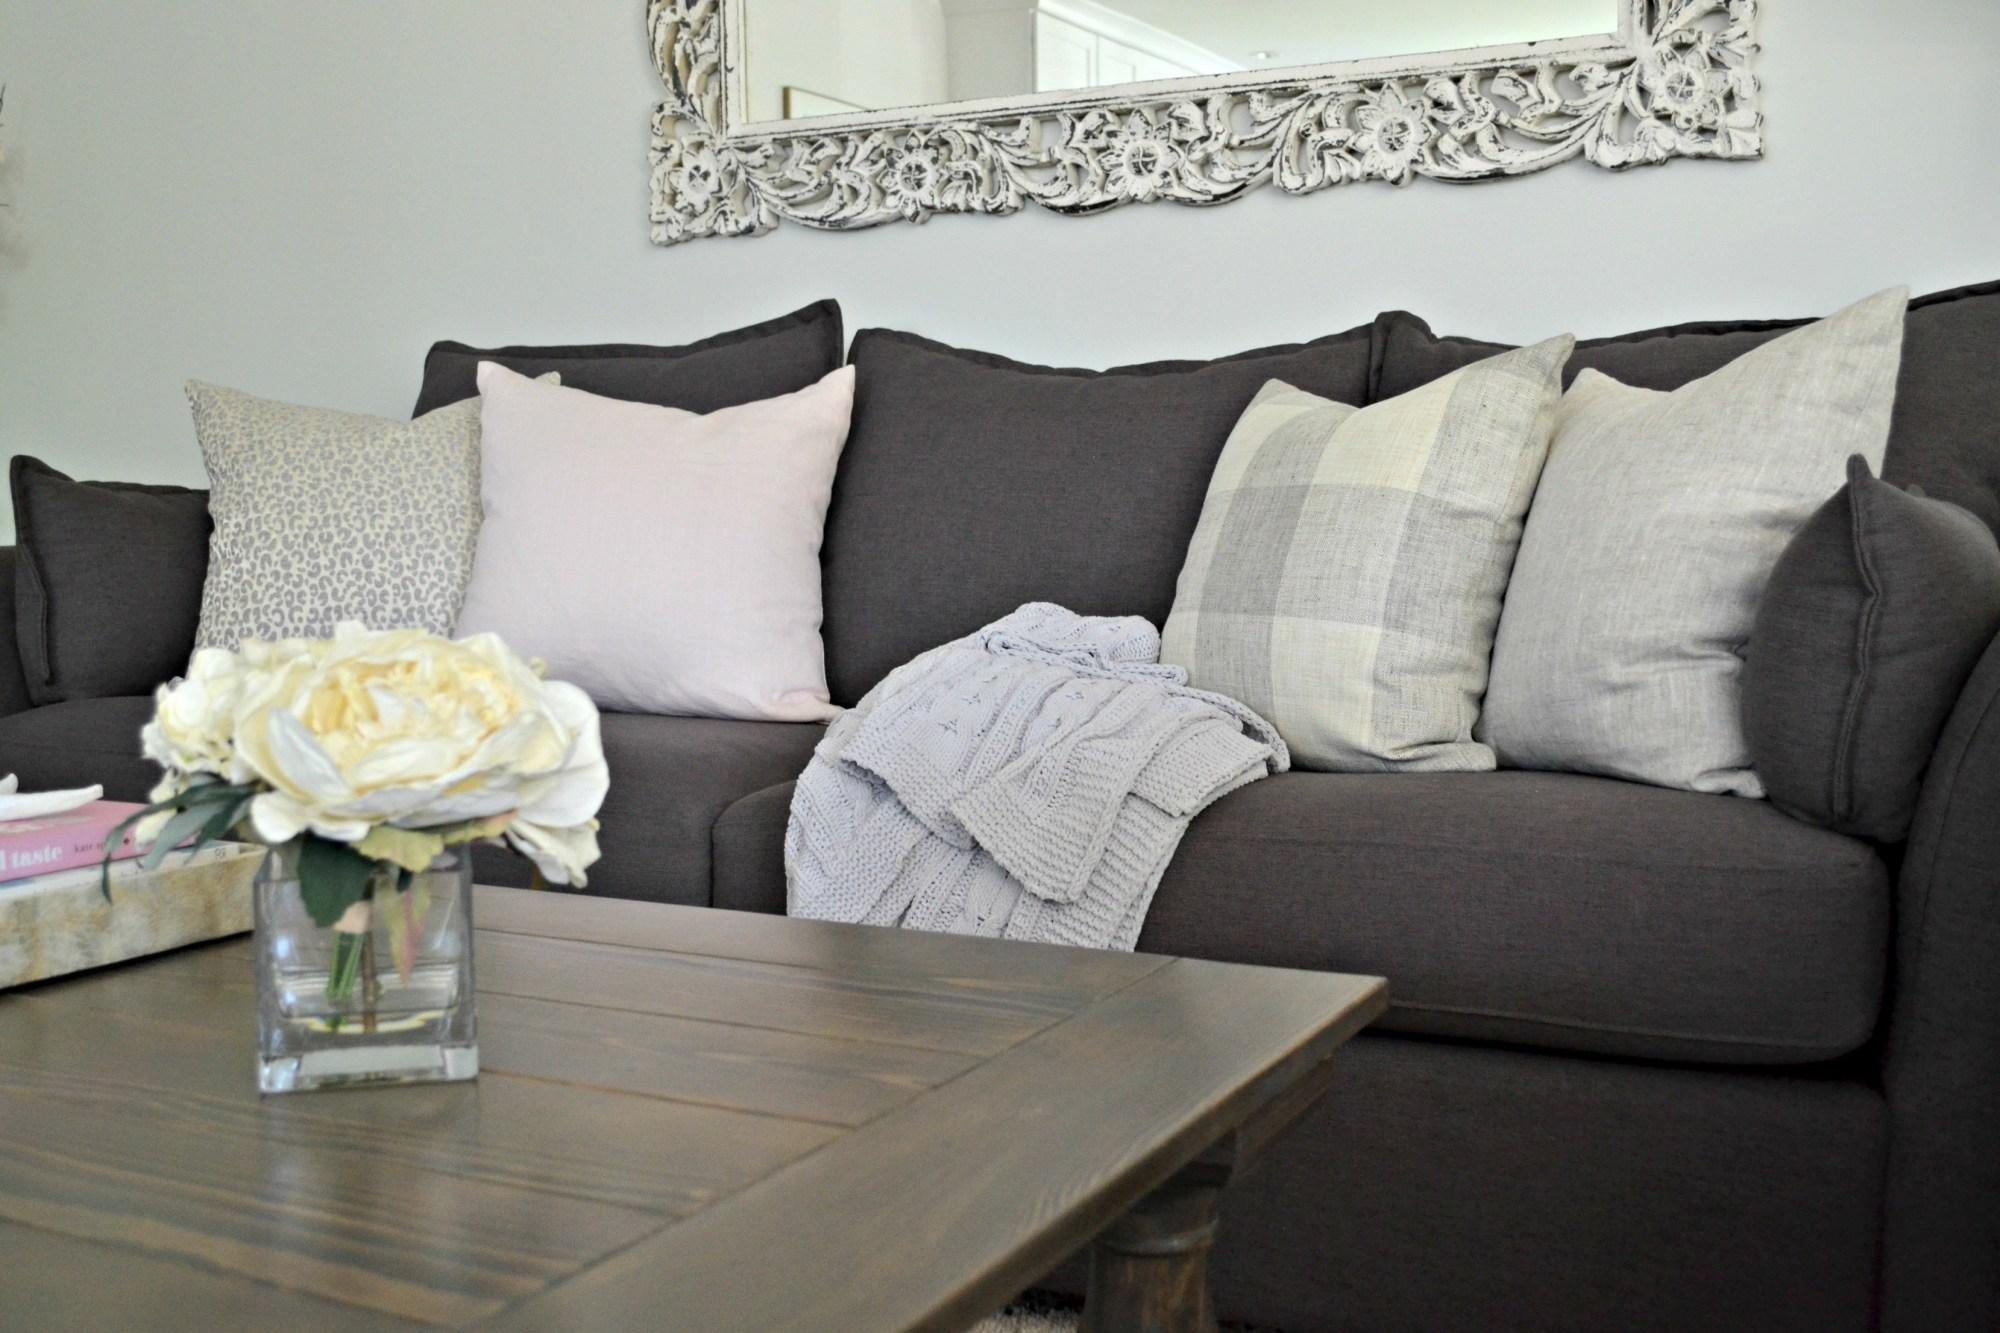 Pillows-couch.jpg